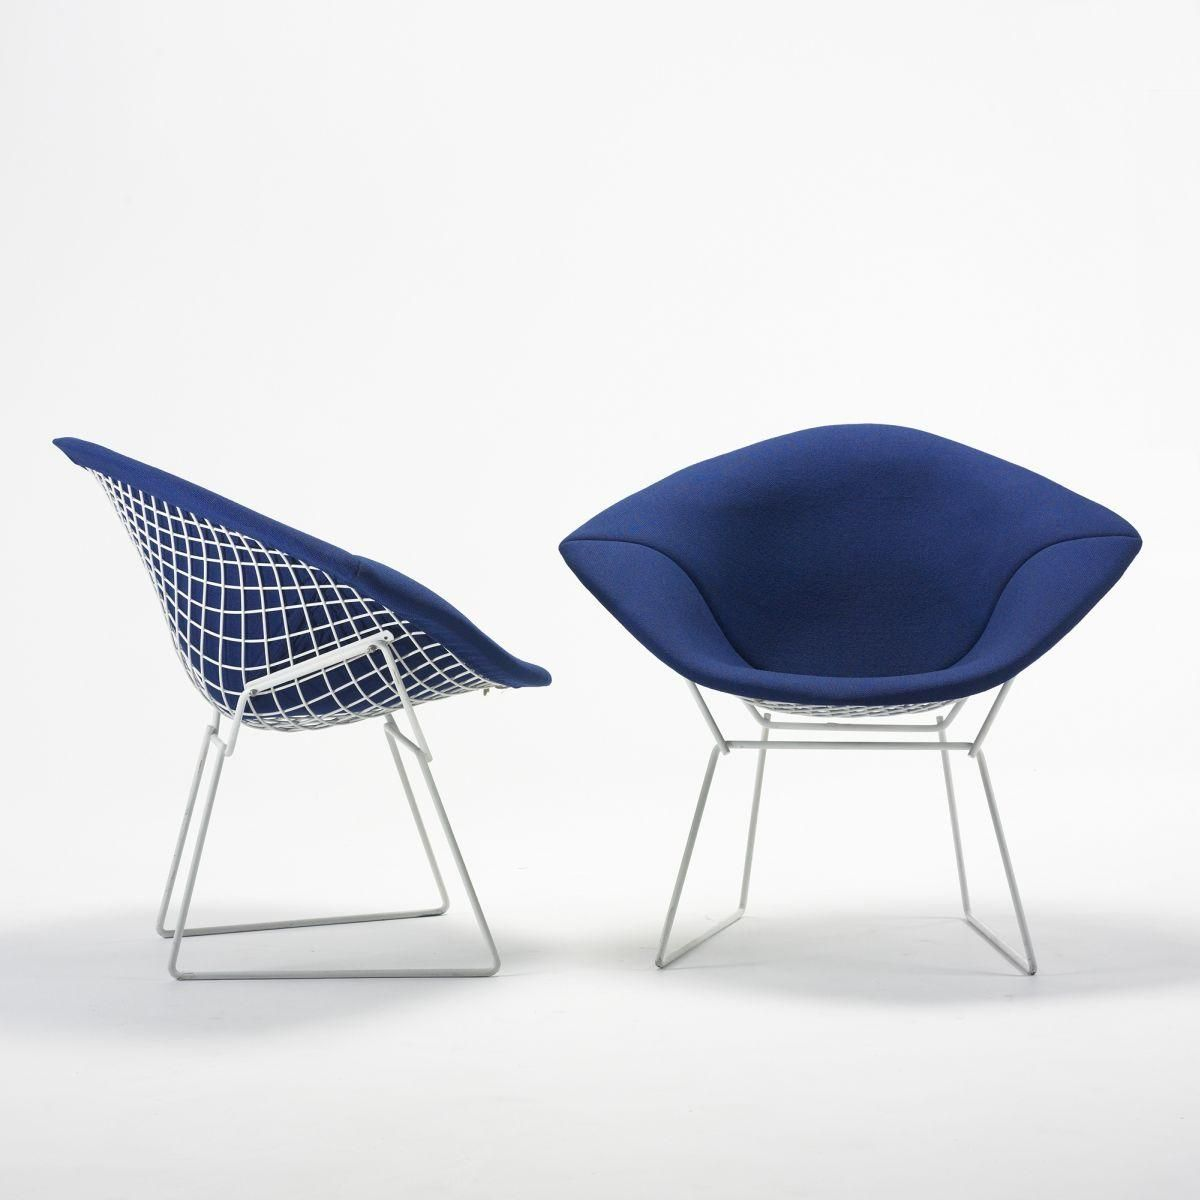 bertoia diamond chair vintage design objects pinterest diamond and cushion interiors. Black Bedroom Furniture Sets. Home Design Ideas